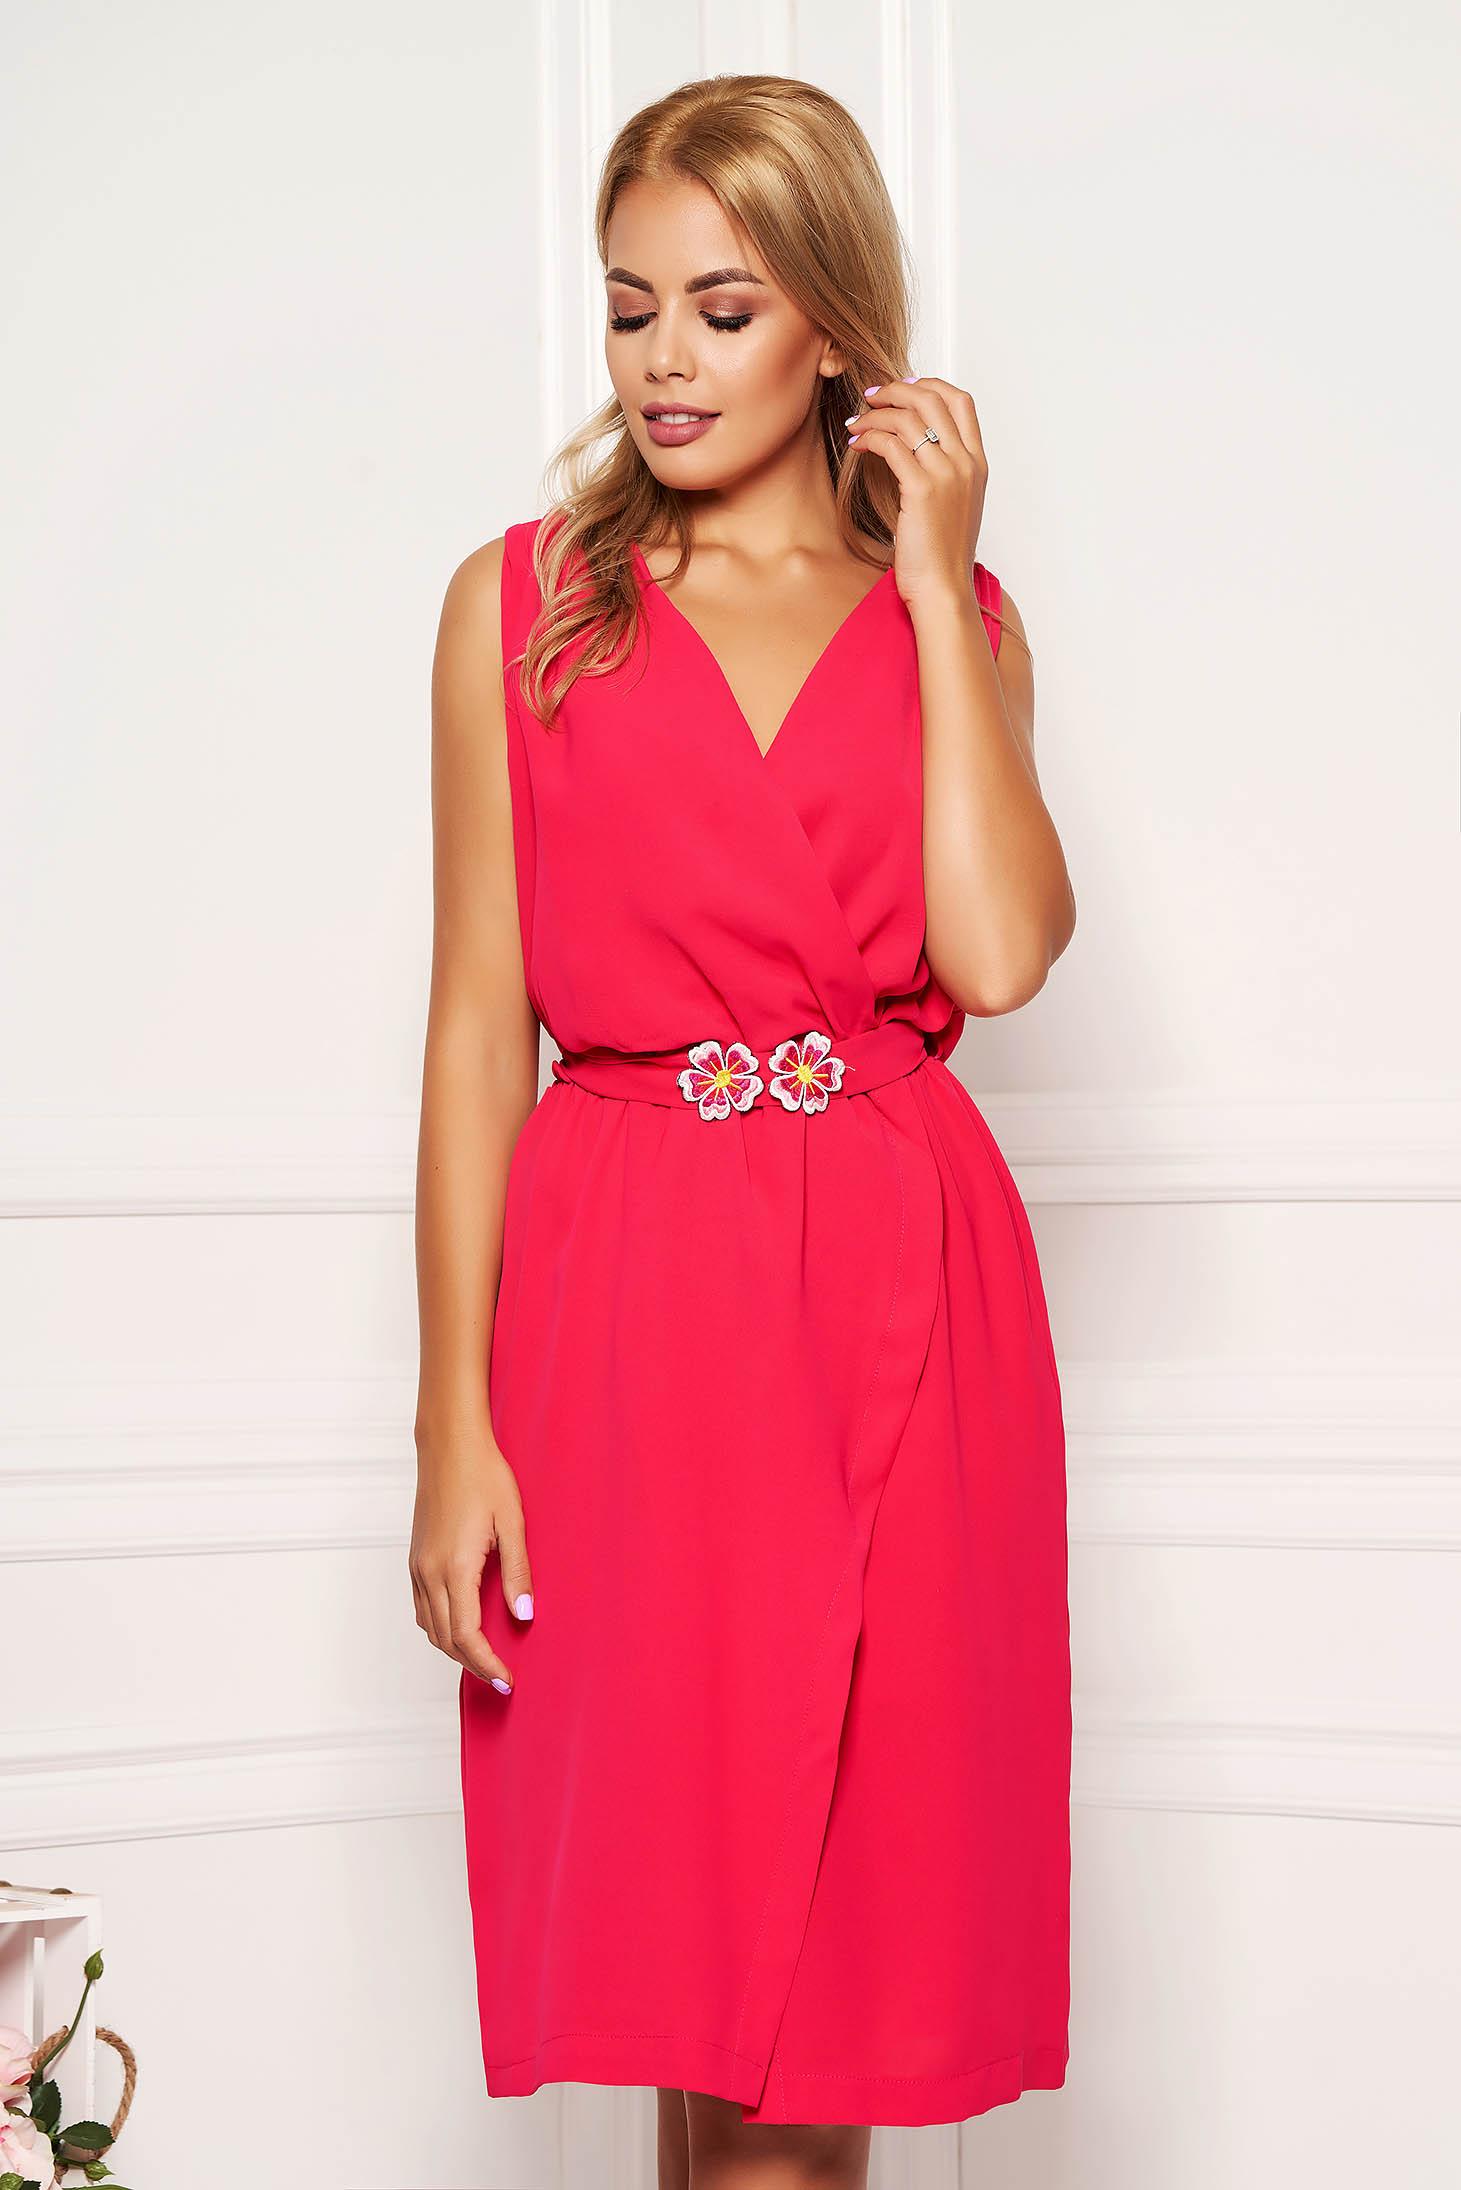 StarShinerS fuchsia dress daily short cut with v-neckline sleeveless wrap over skirt straight